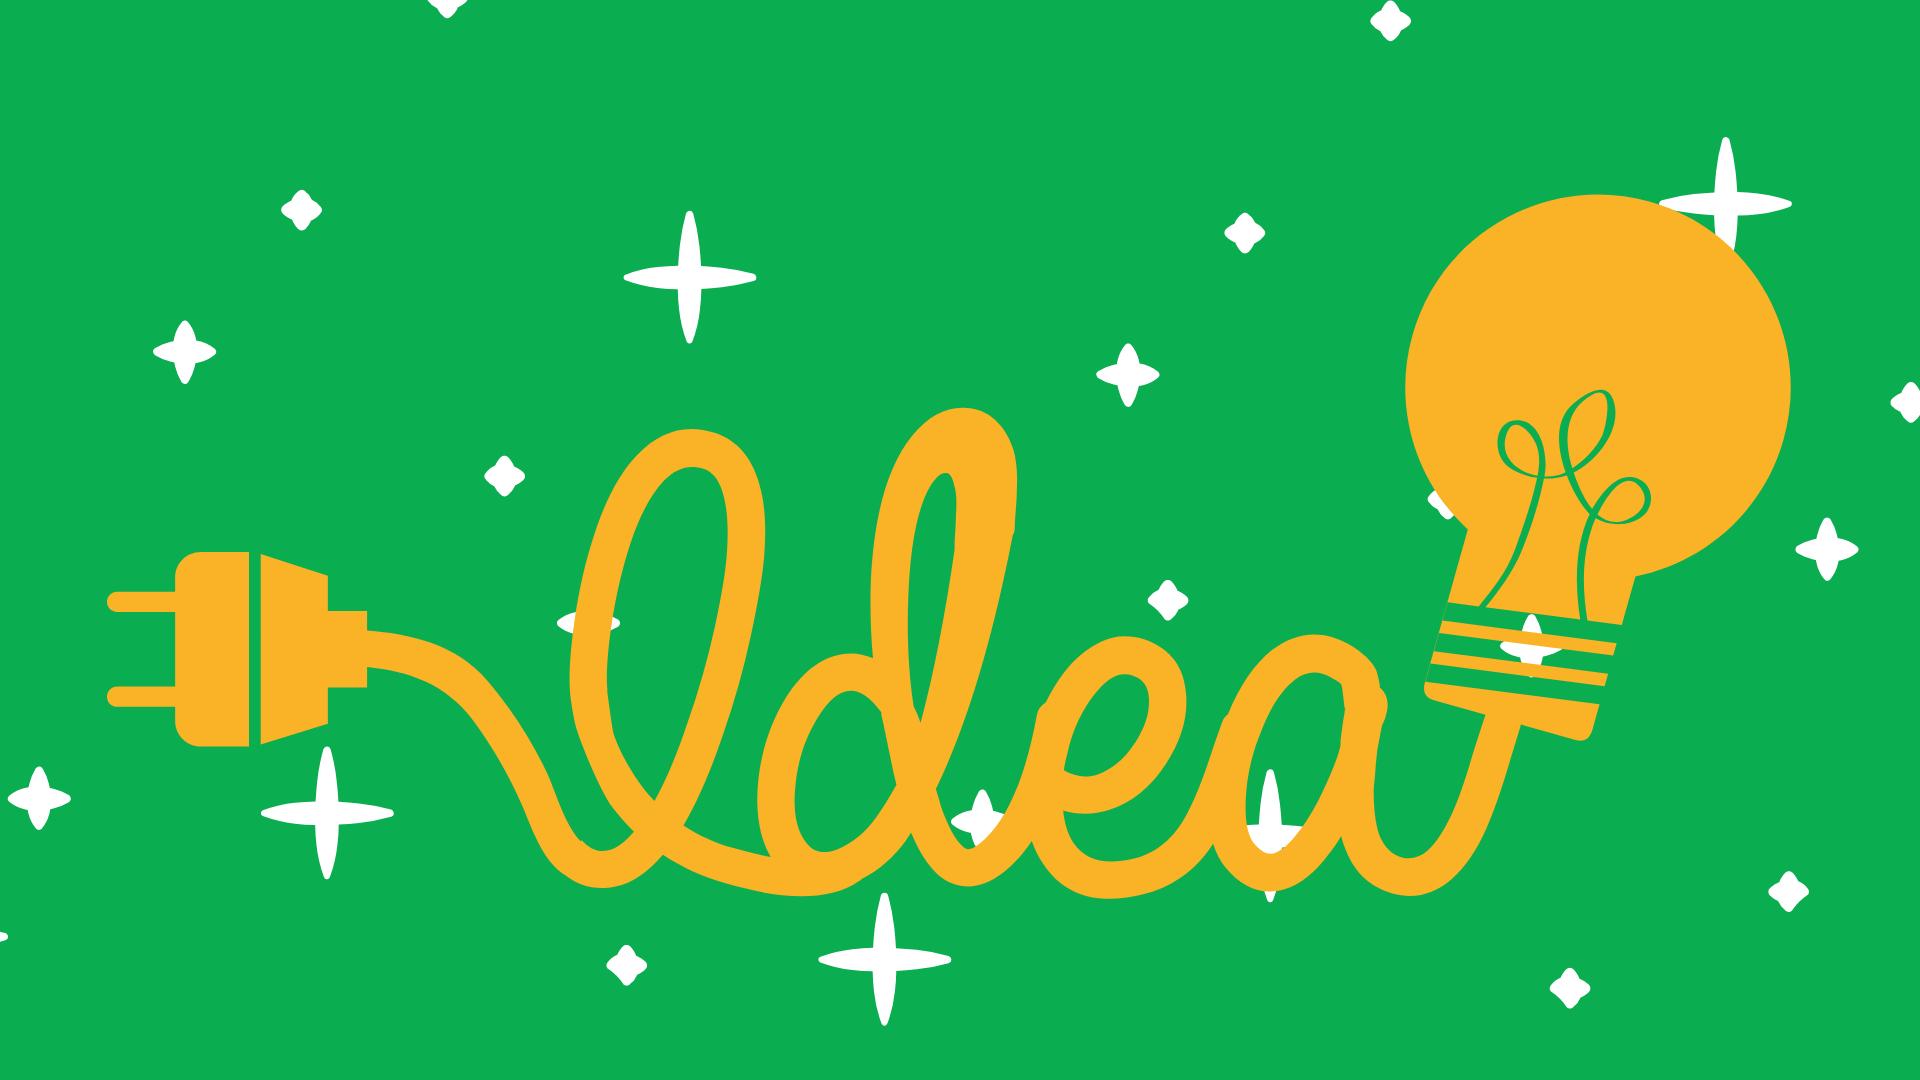 Técnicas para generación de ideas